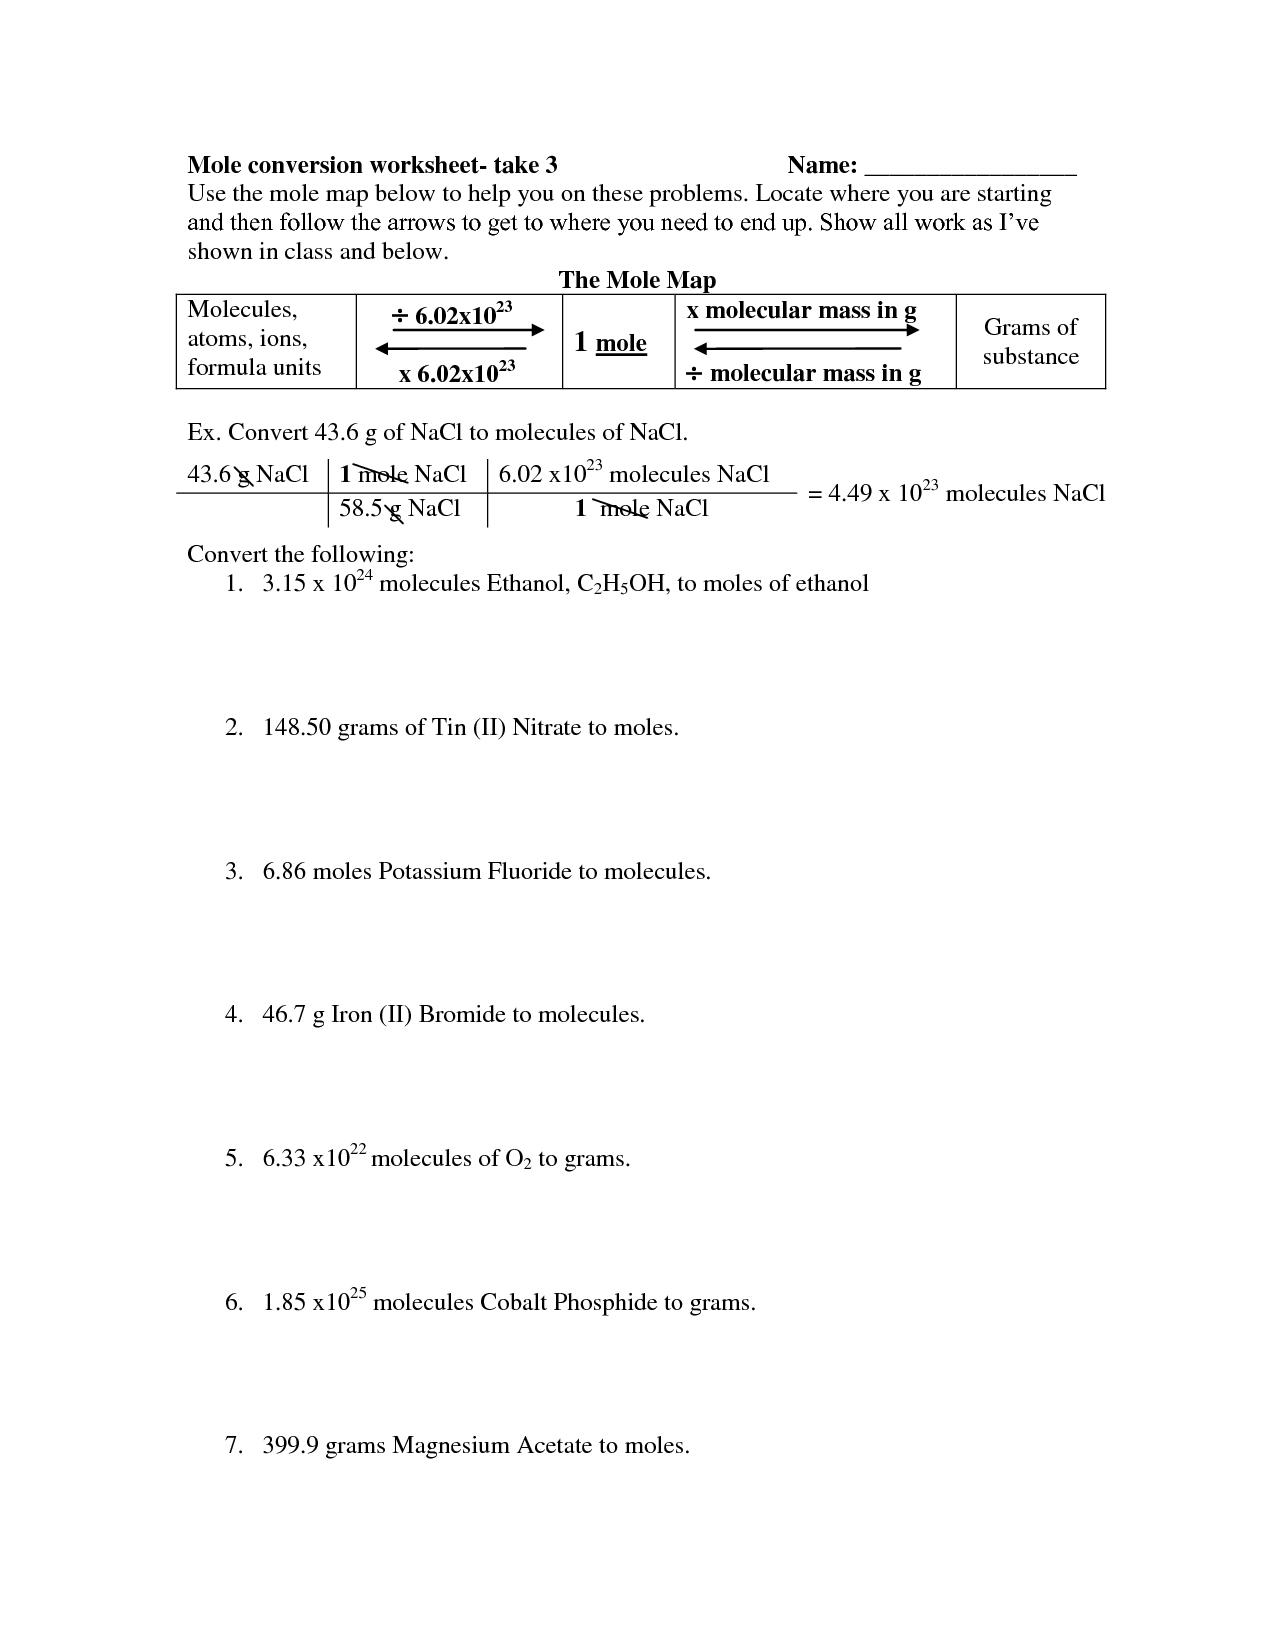 Mole Ratio Worksheet Chemistry Answers